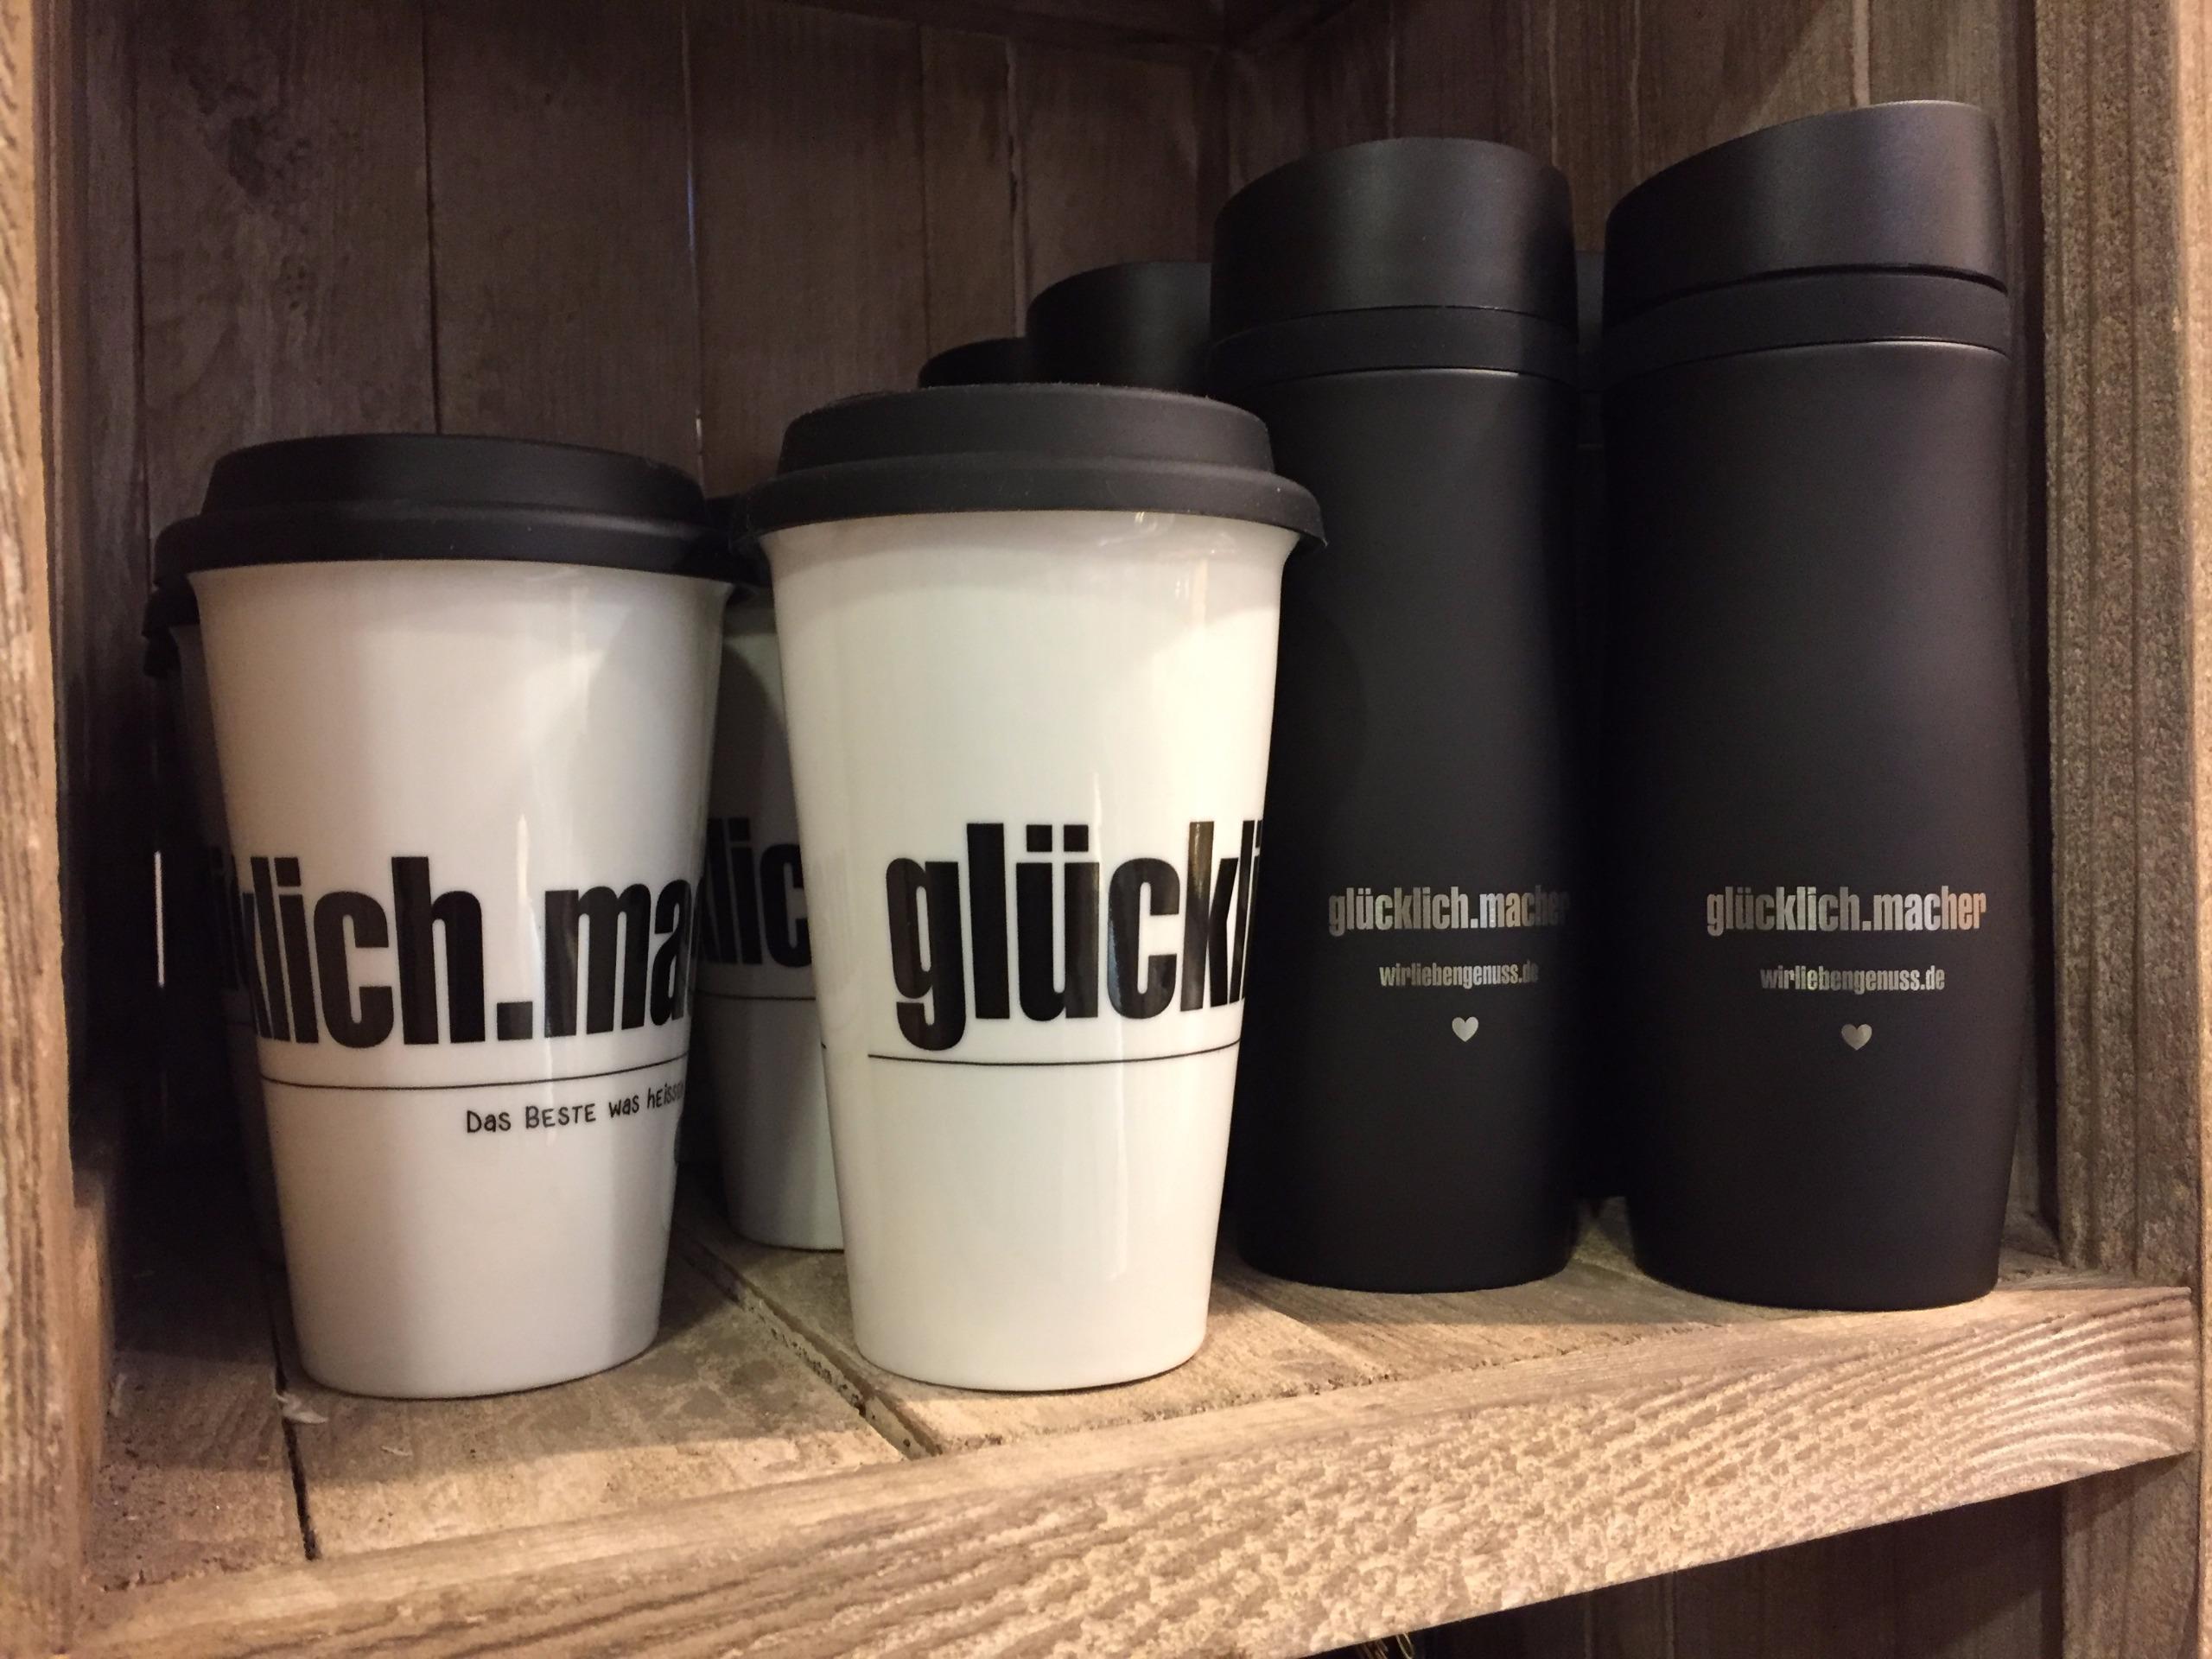 Bäckerei Wanner Verkauft Coffee To Go Becher Crema Extensa Nero